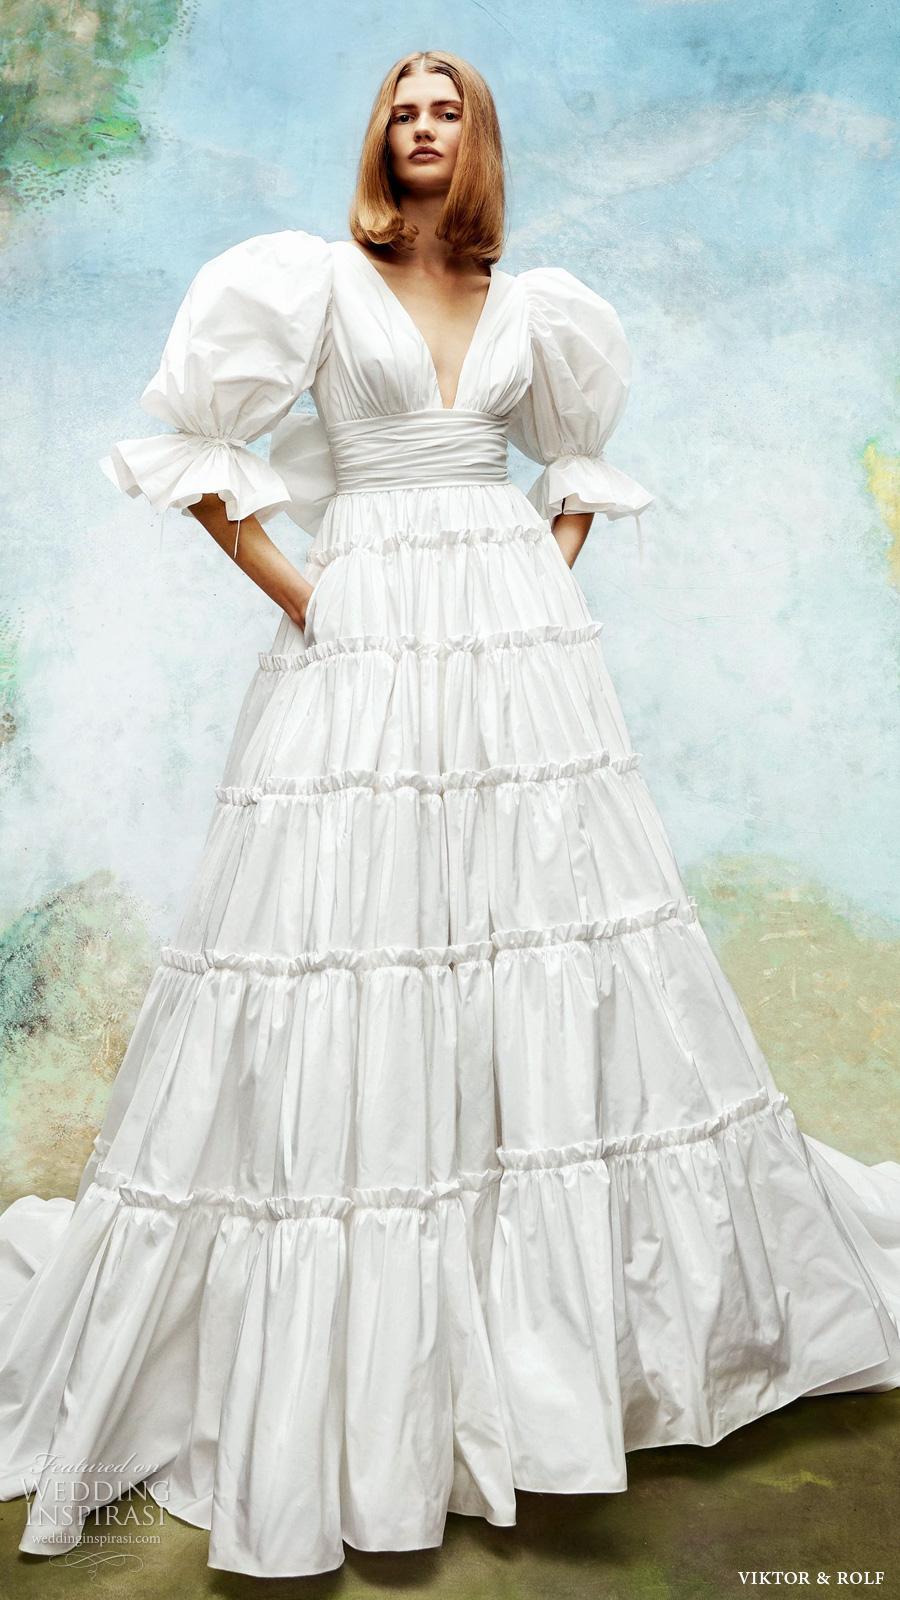 viktor rolf 2020 bridal puff sleeve half sleeve v neckline a line ball gown tafetta wedding dress (1) mv